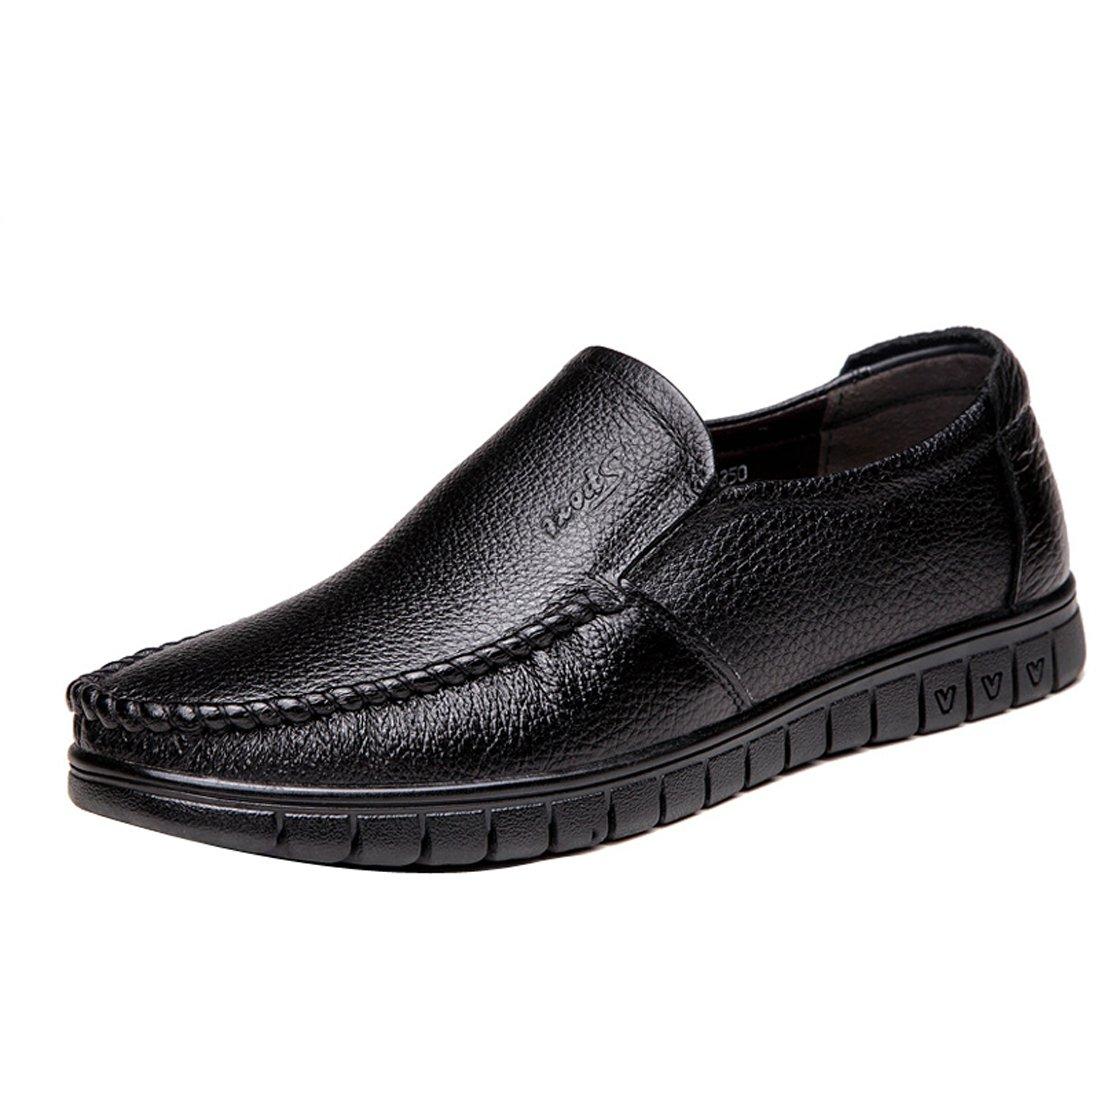 Gaorui Fashion Men Slip On Business Casual Shoe Faux Leather Moccasins Antislip Loafers